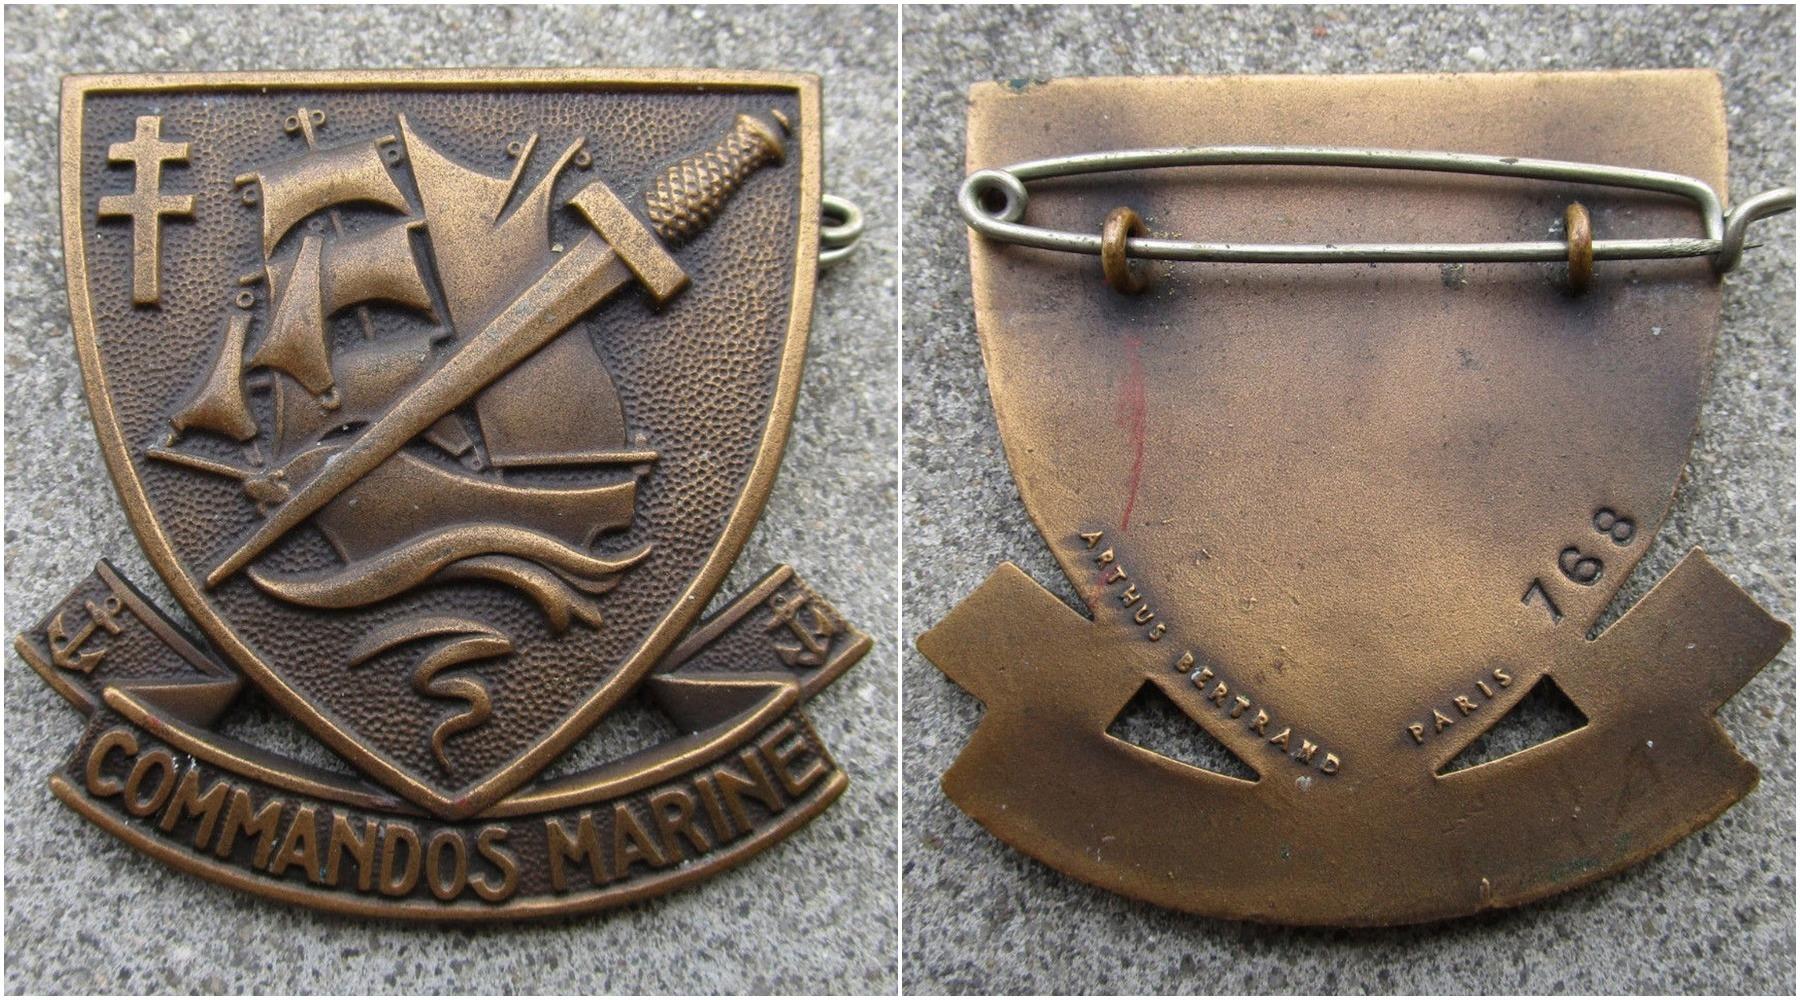 Identification insigne commandos marine  - Page 2 Page111